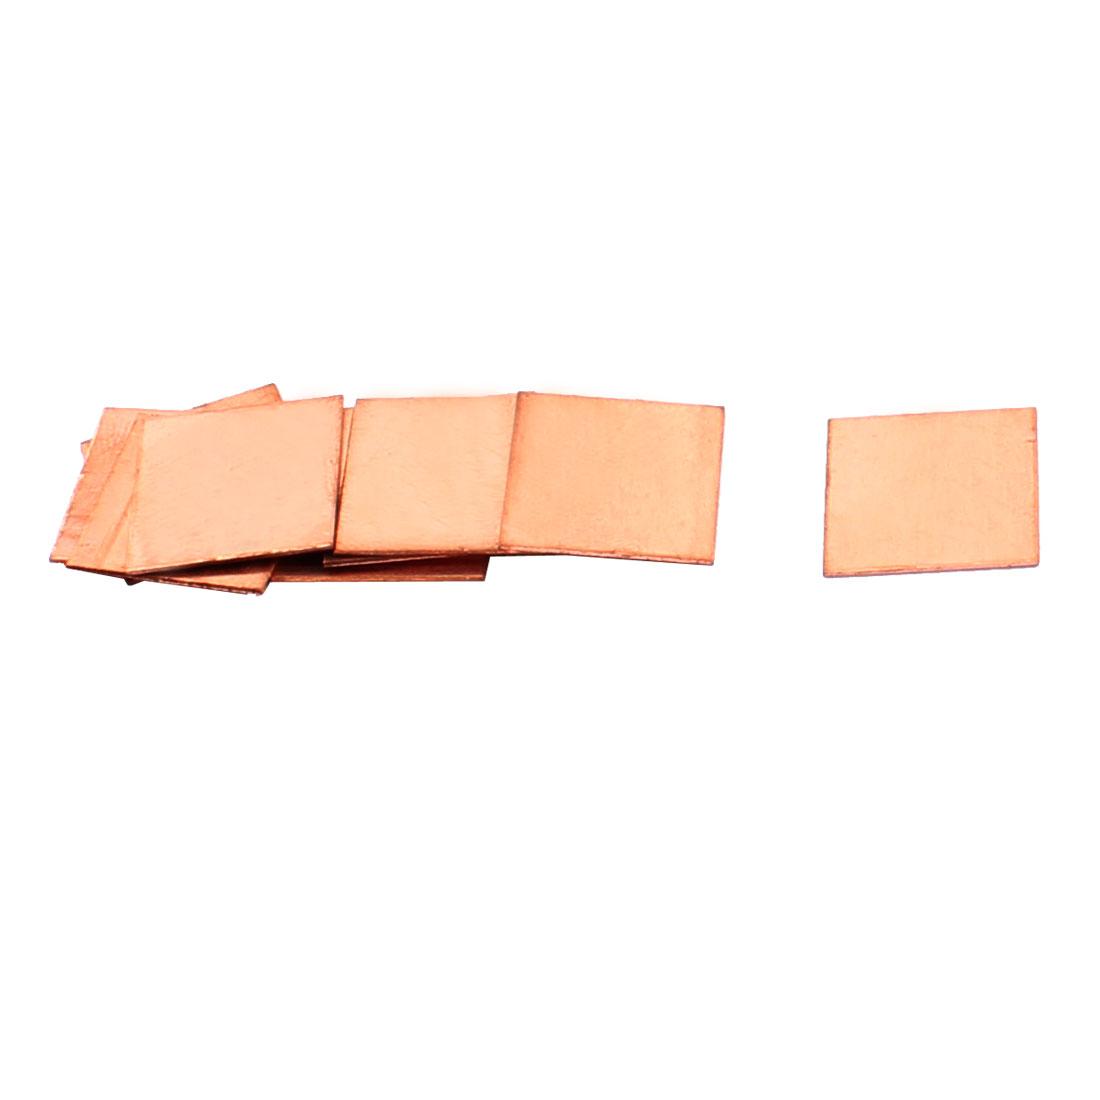 10pcs 15mmx15mmx0.5mm Copper Square Heatsink Thermal Pad Shim for PC Laptop CPU